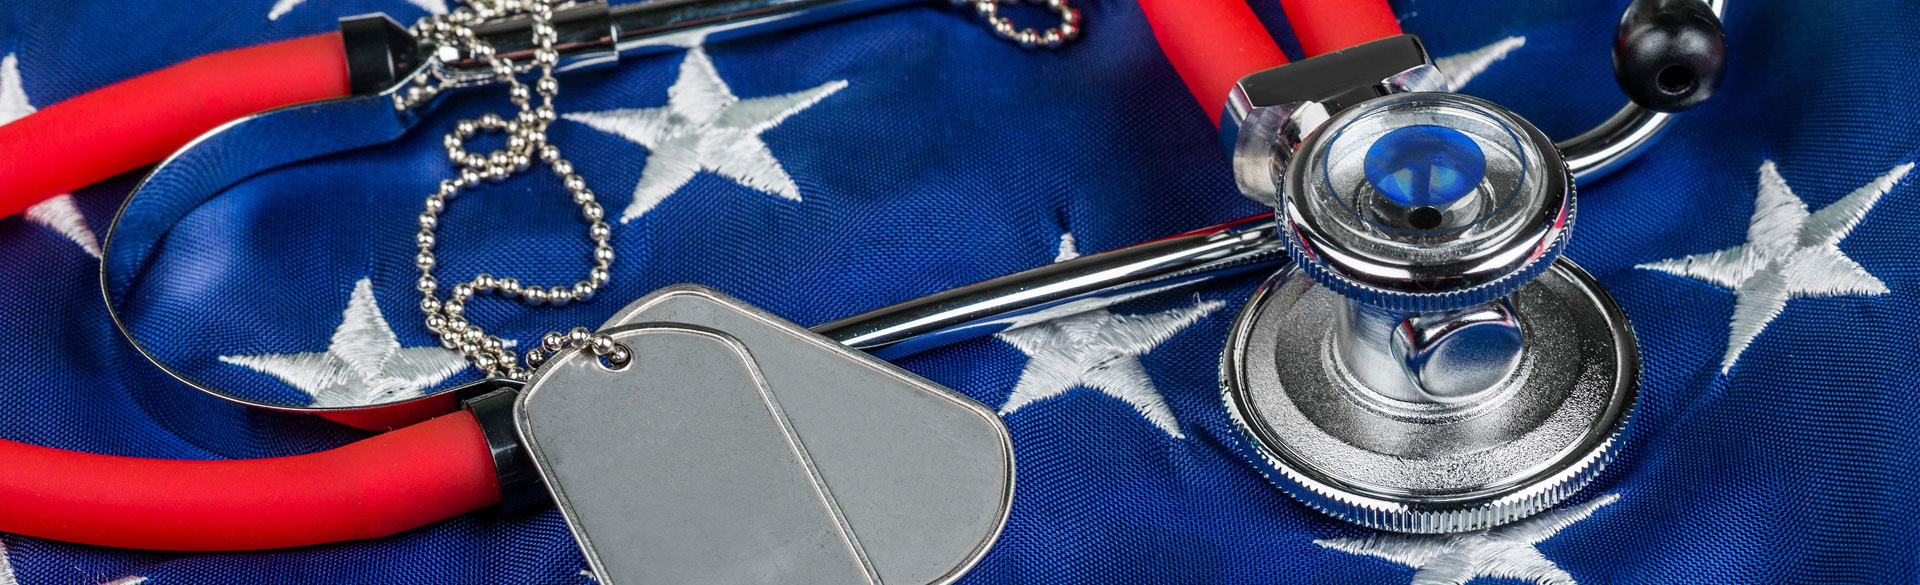 Jonas scholar Damon Toczylowski fights to provide better health care for veterans